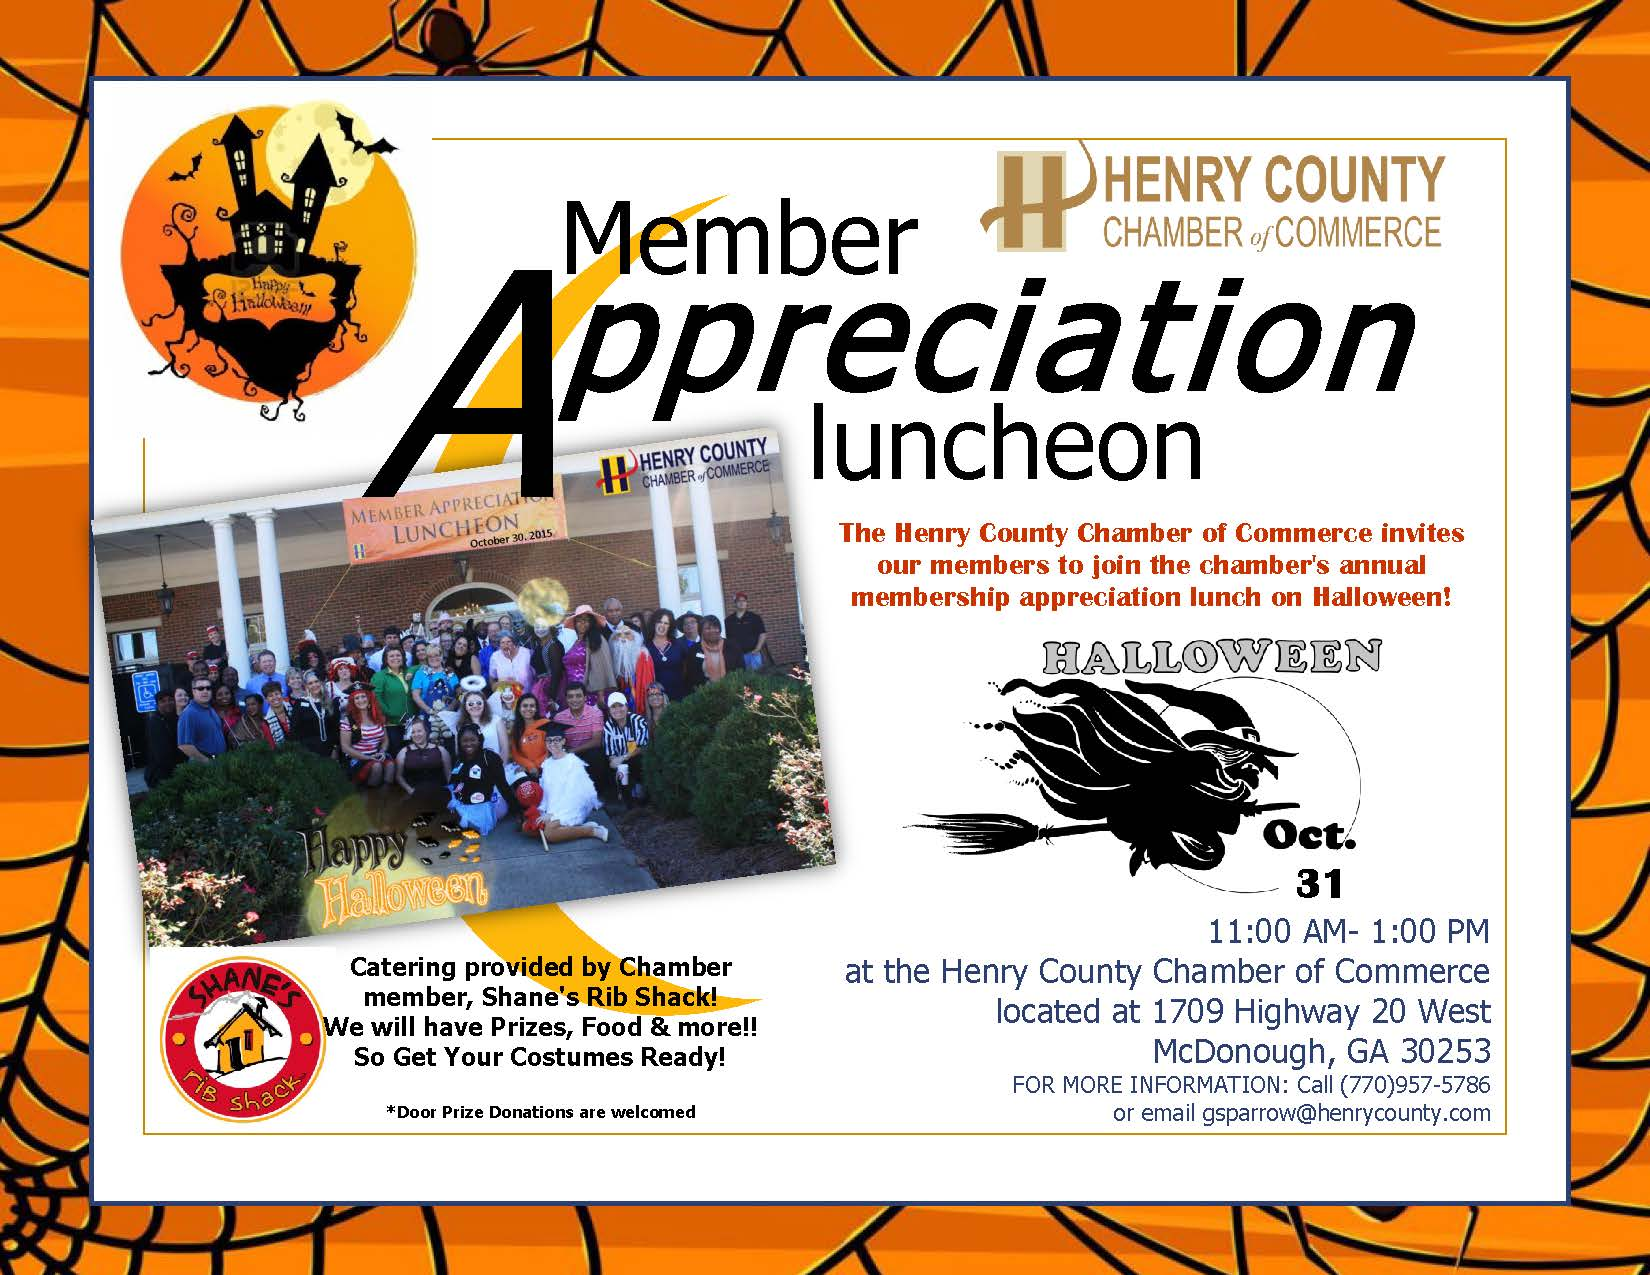 October is Member Appreciation Month